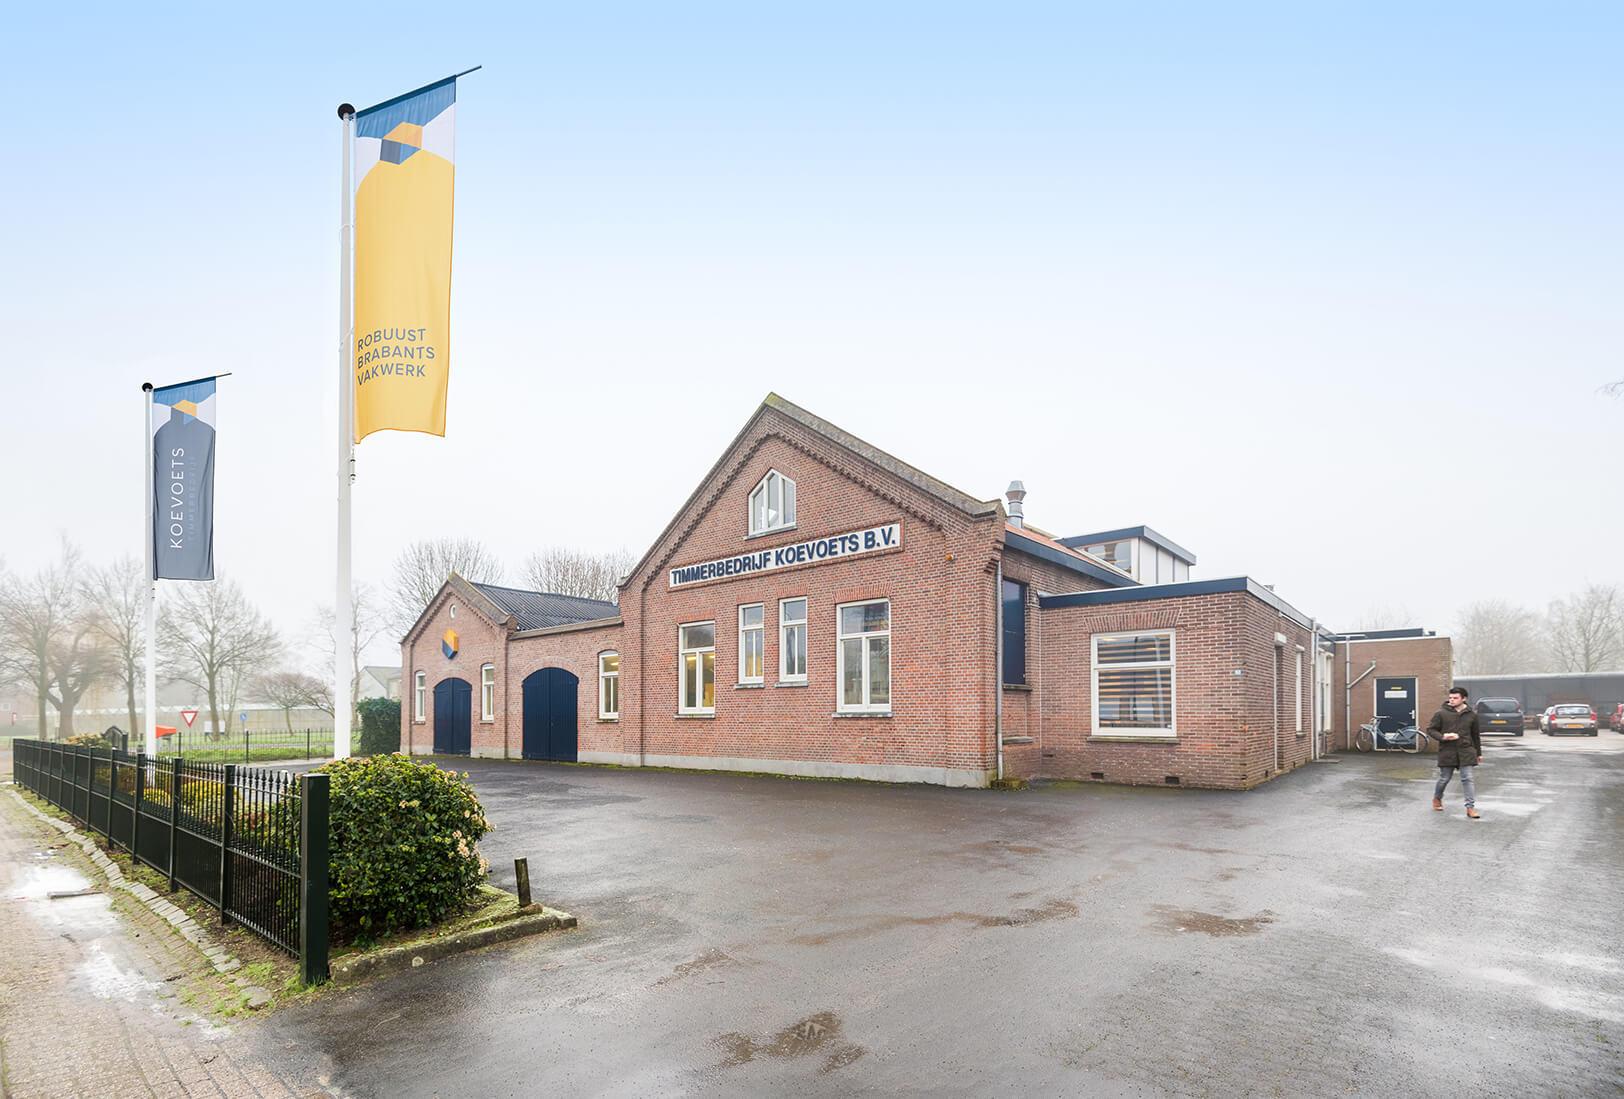 https://brandmatters.nl/app/uploads/2020/05/GijsProostFotografie-koevoets-_GPF9490.jpg